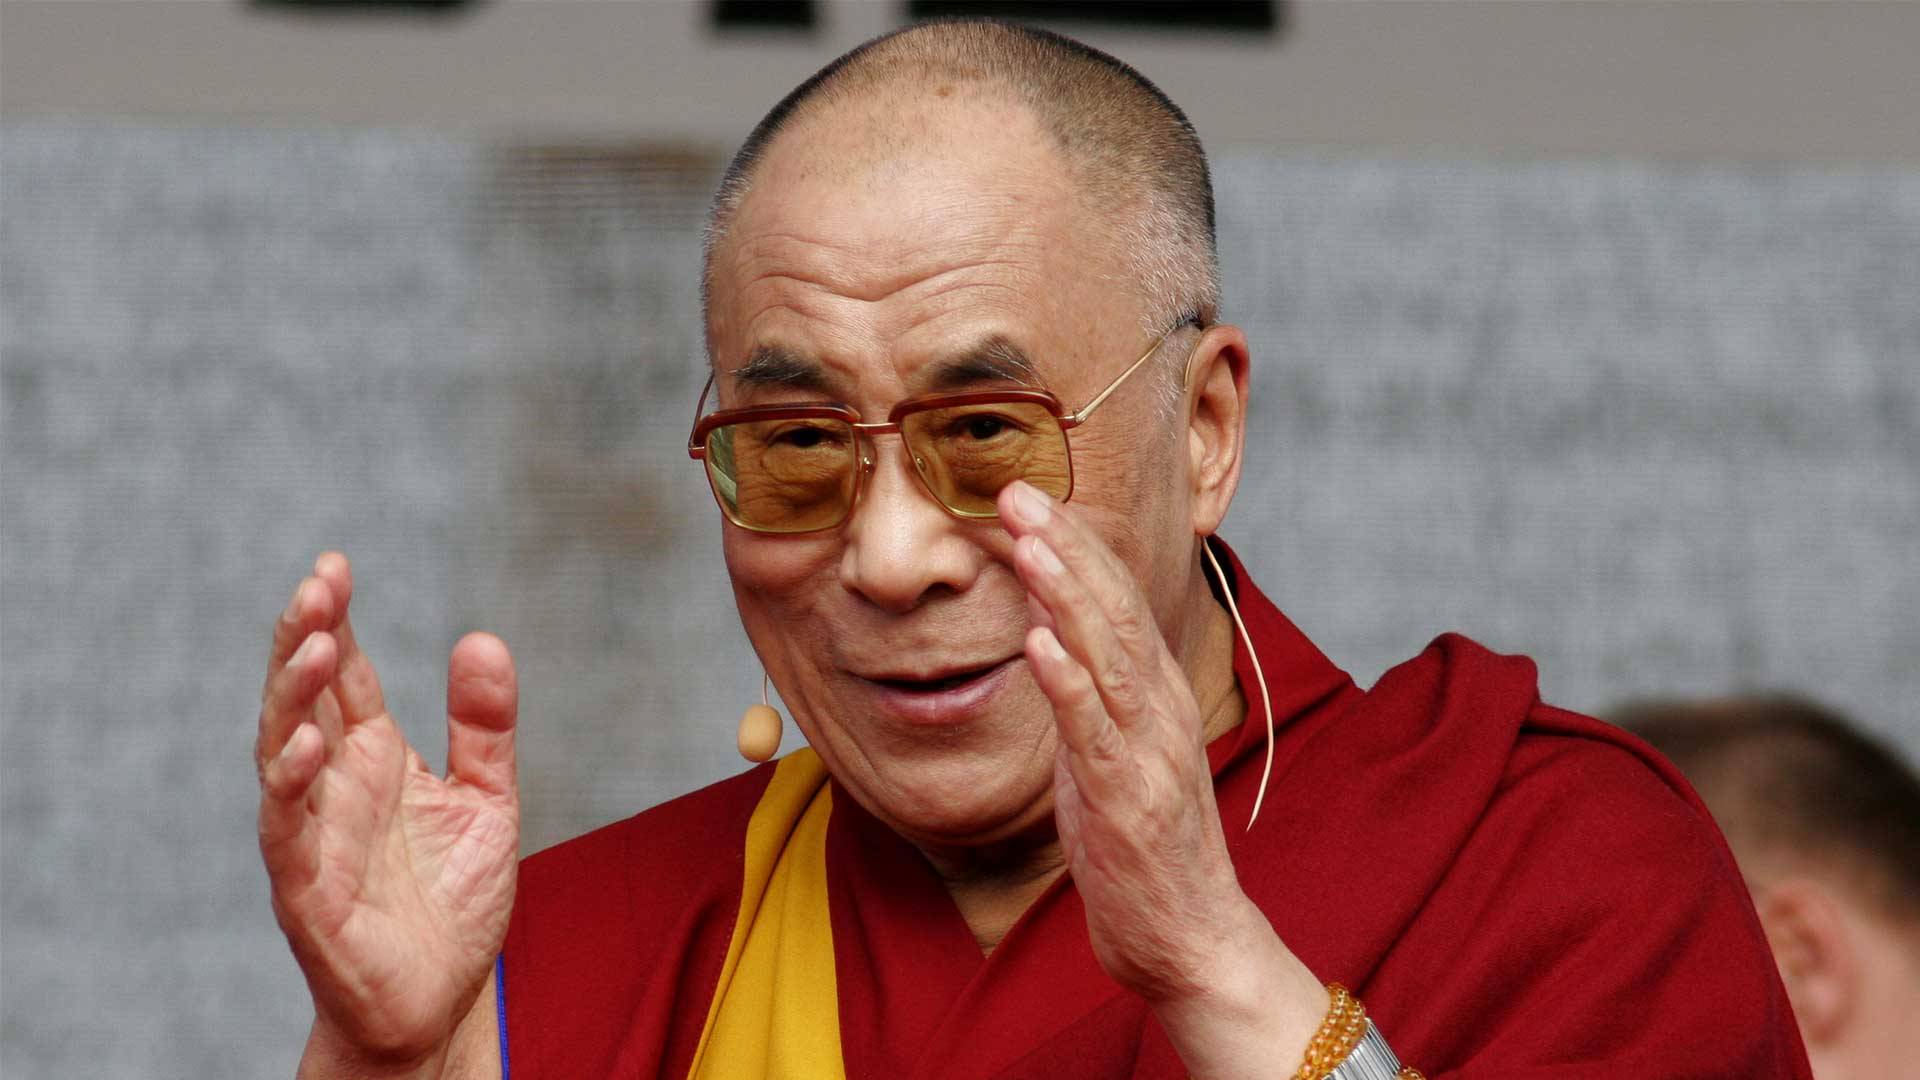 singularityhub.com - Singularity Hub Staff - Technology and Compassion: A Conversation with the Dalai Lama